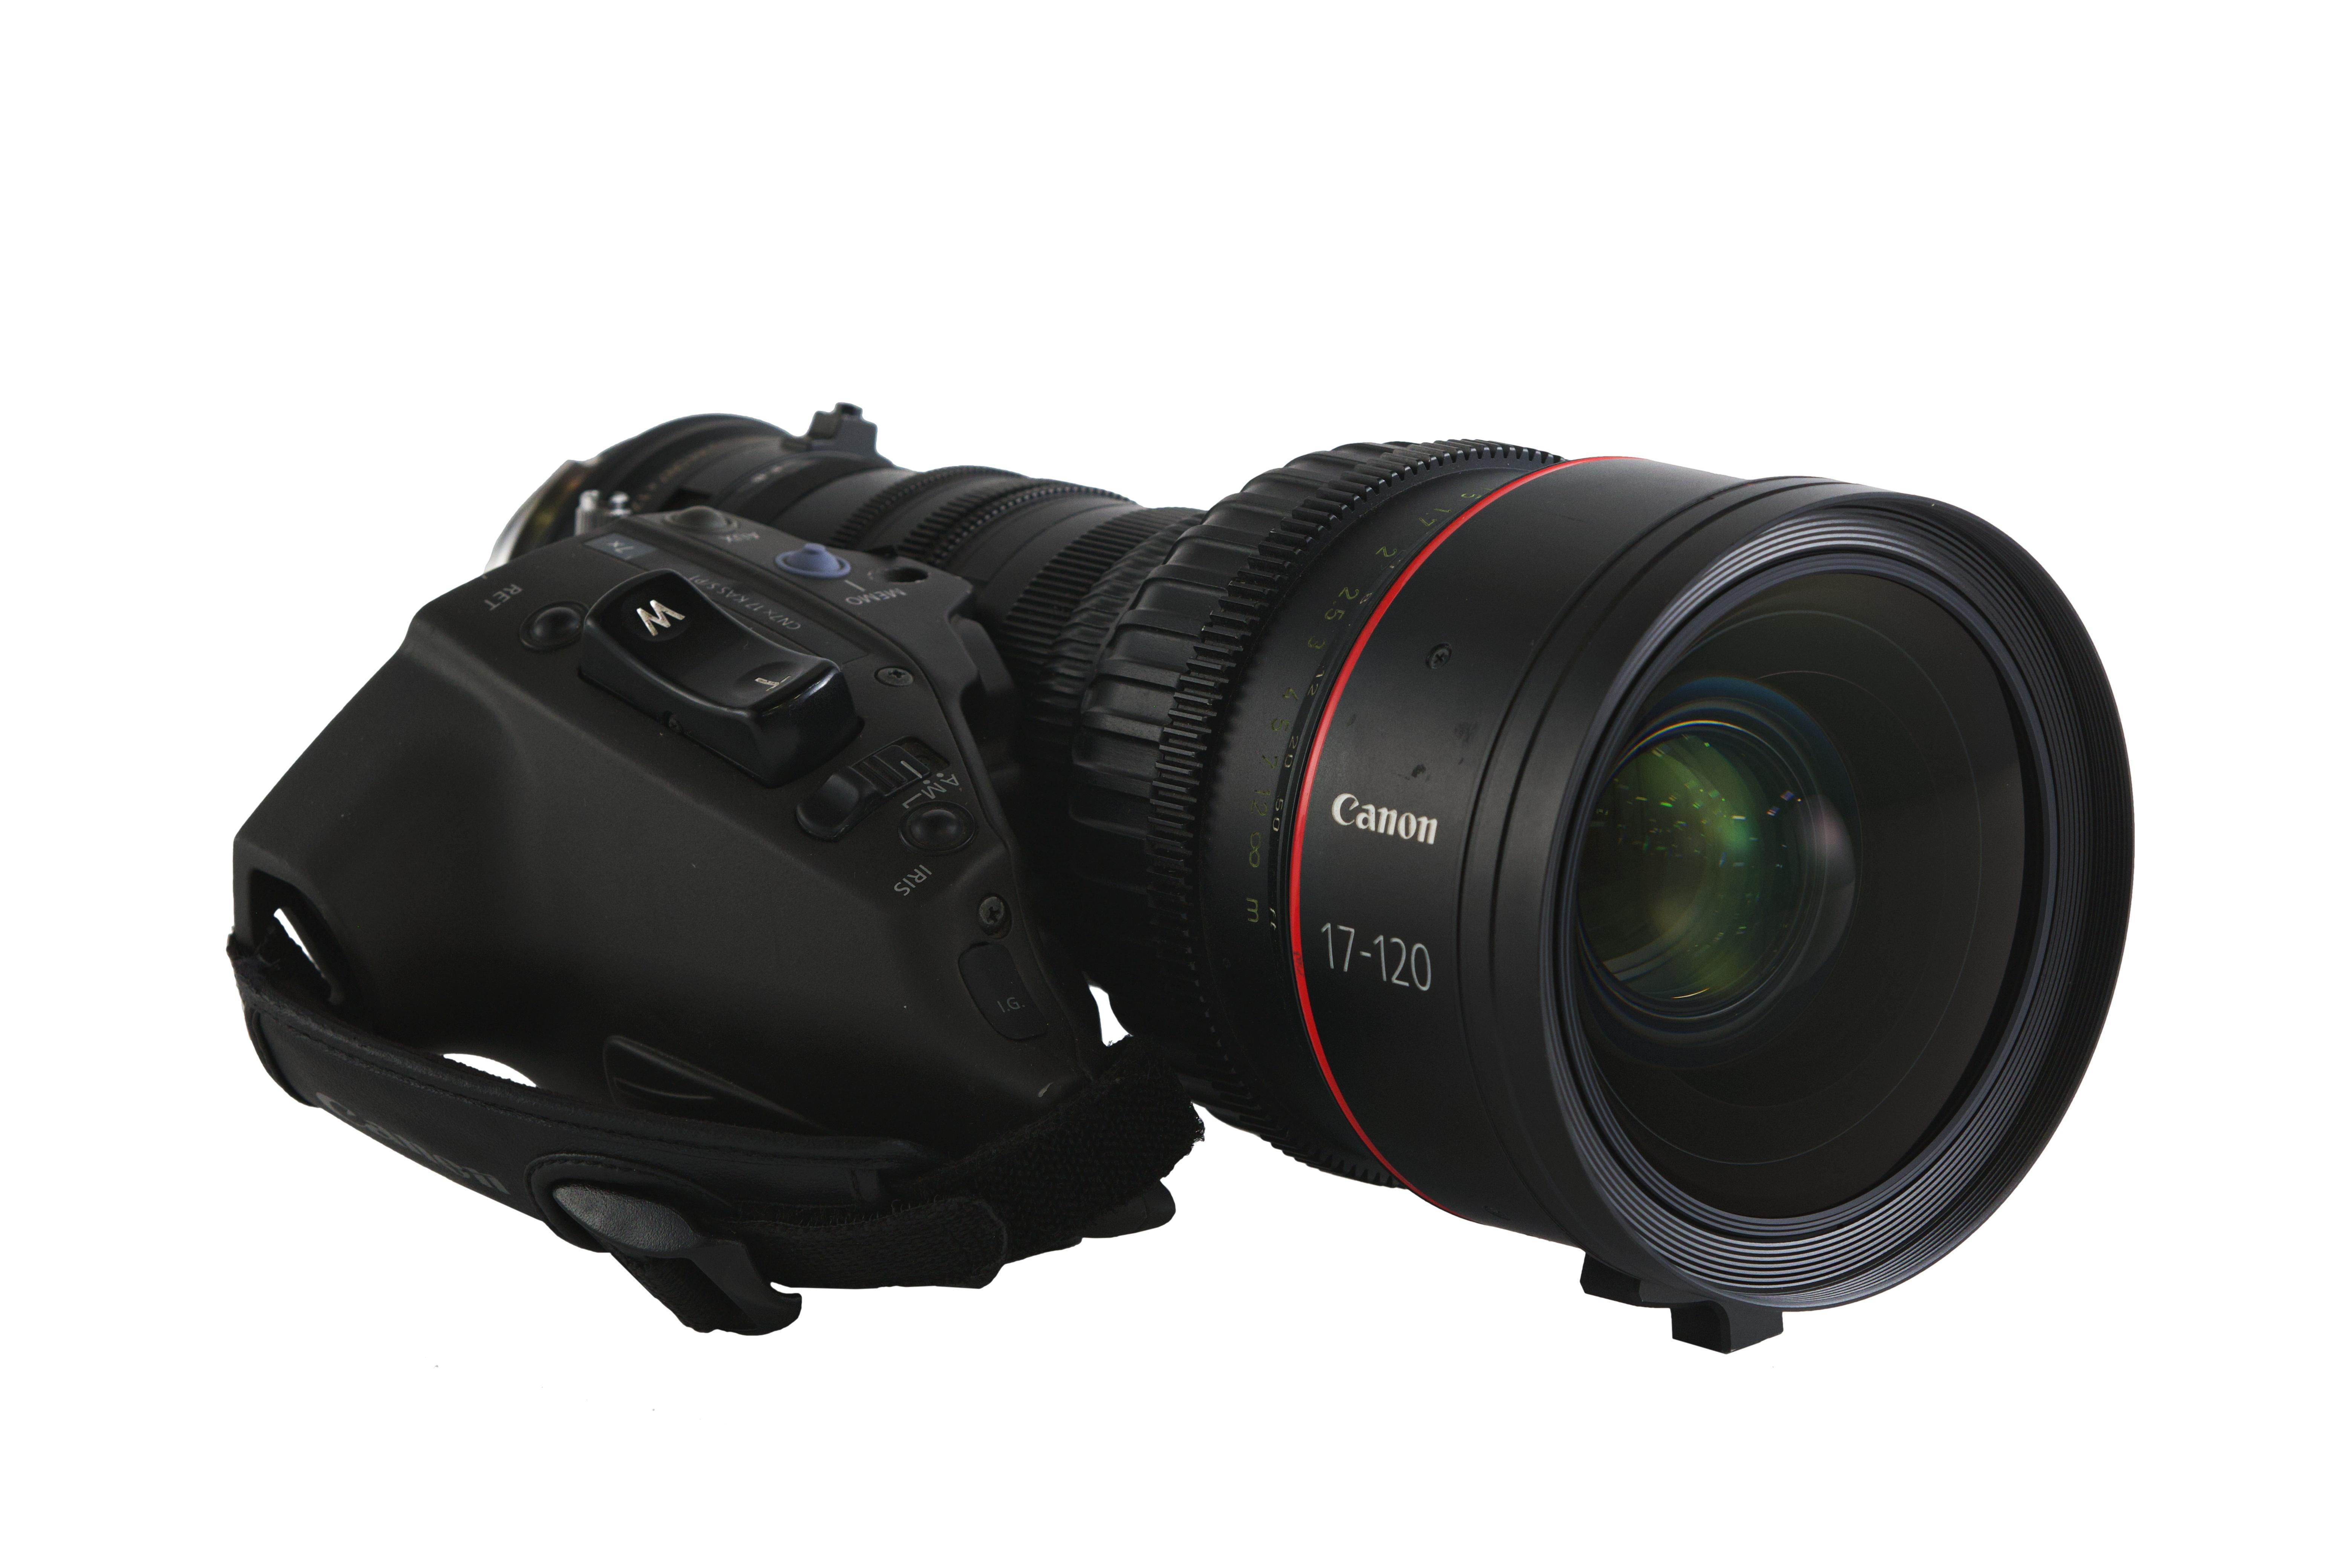 Canon 17-120mm T2.95 Cine-Servo Zoom